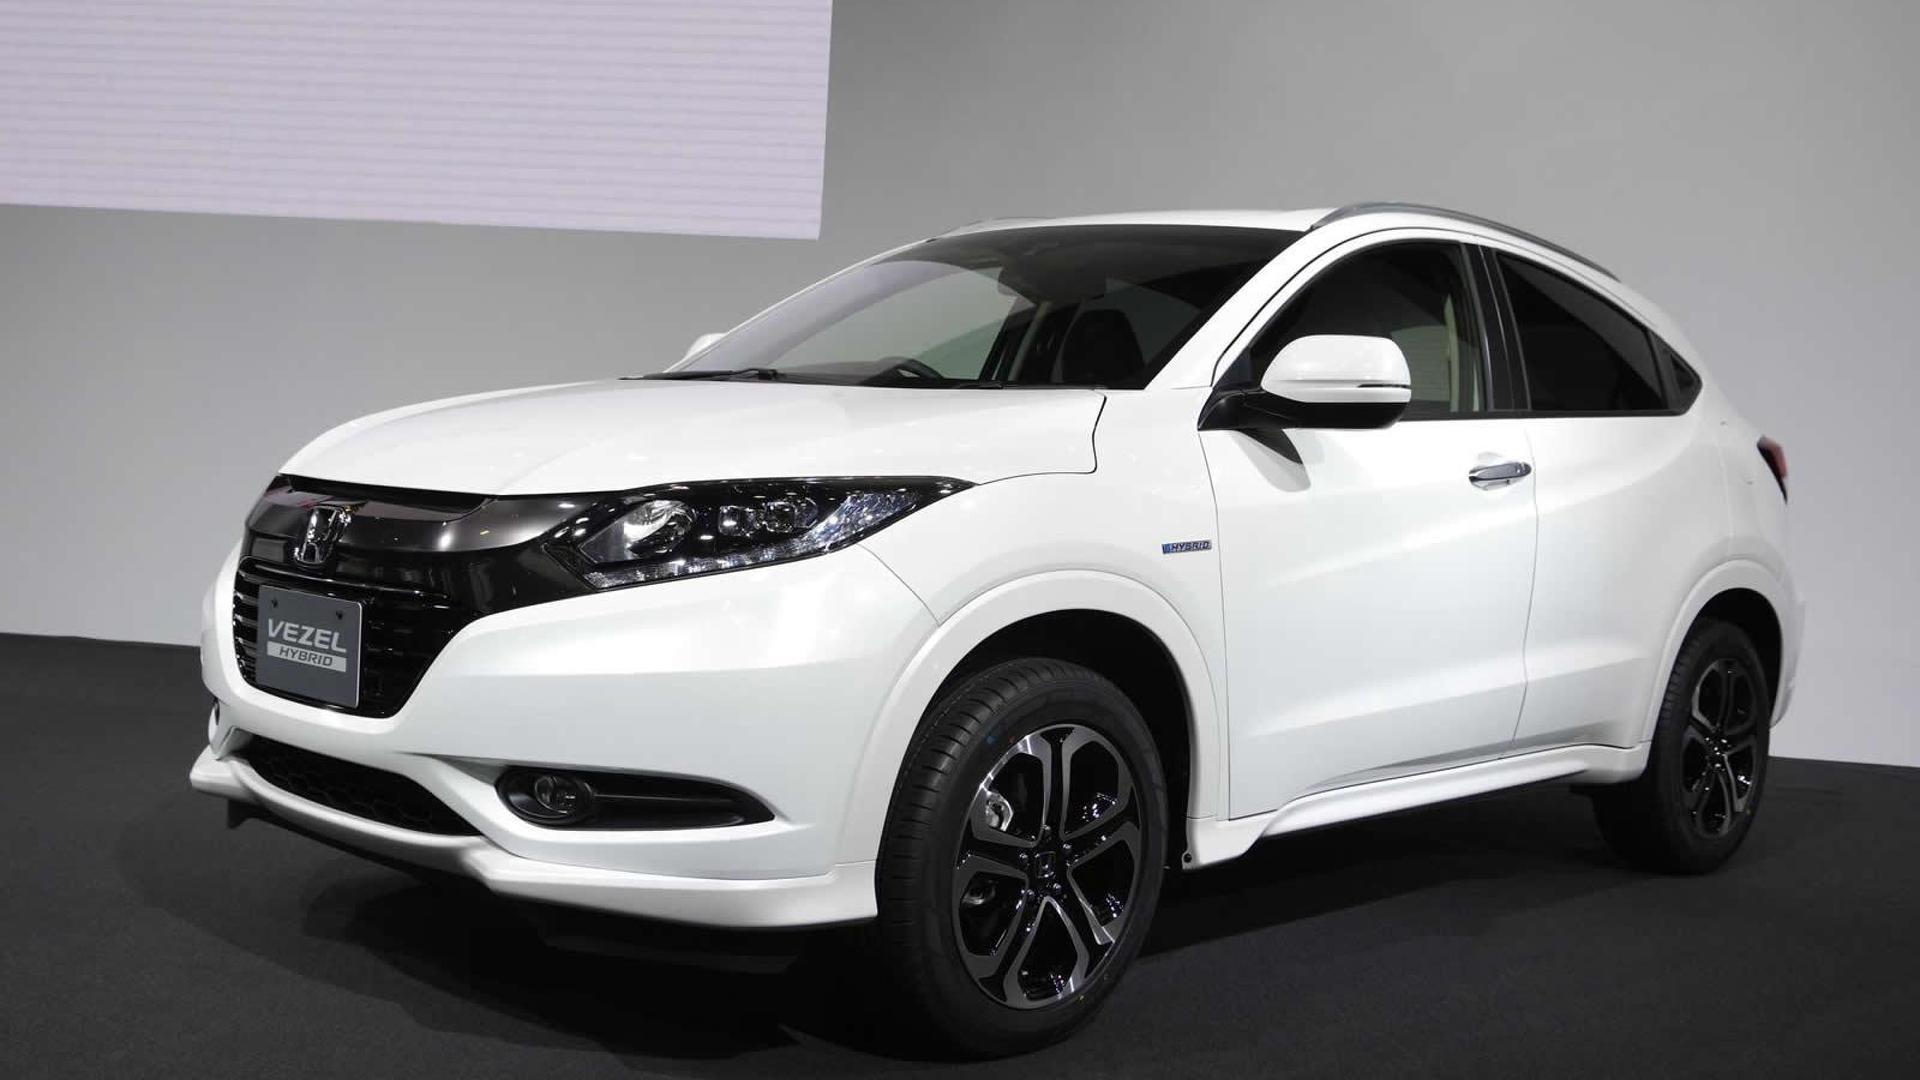 Honda Vezel Hitting Stateside Next Year Europe In 2015